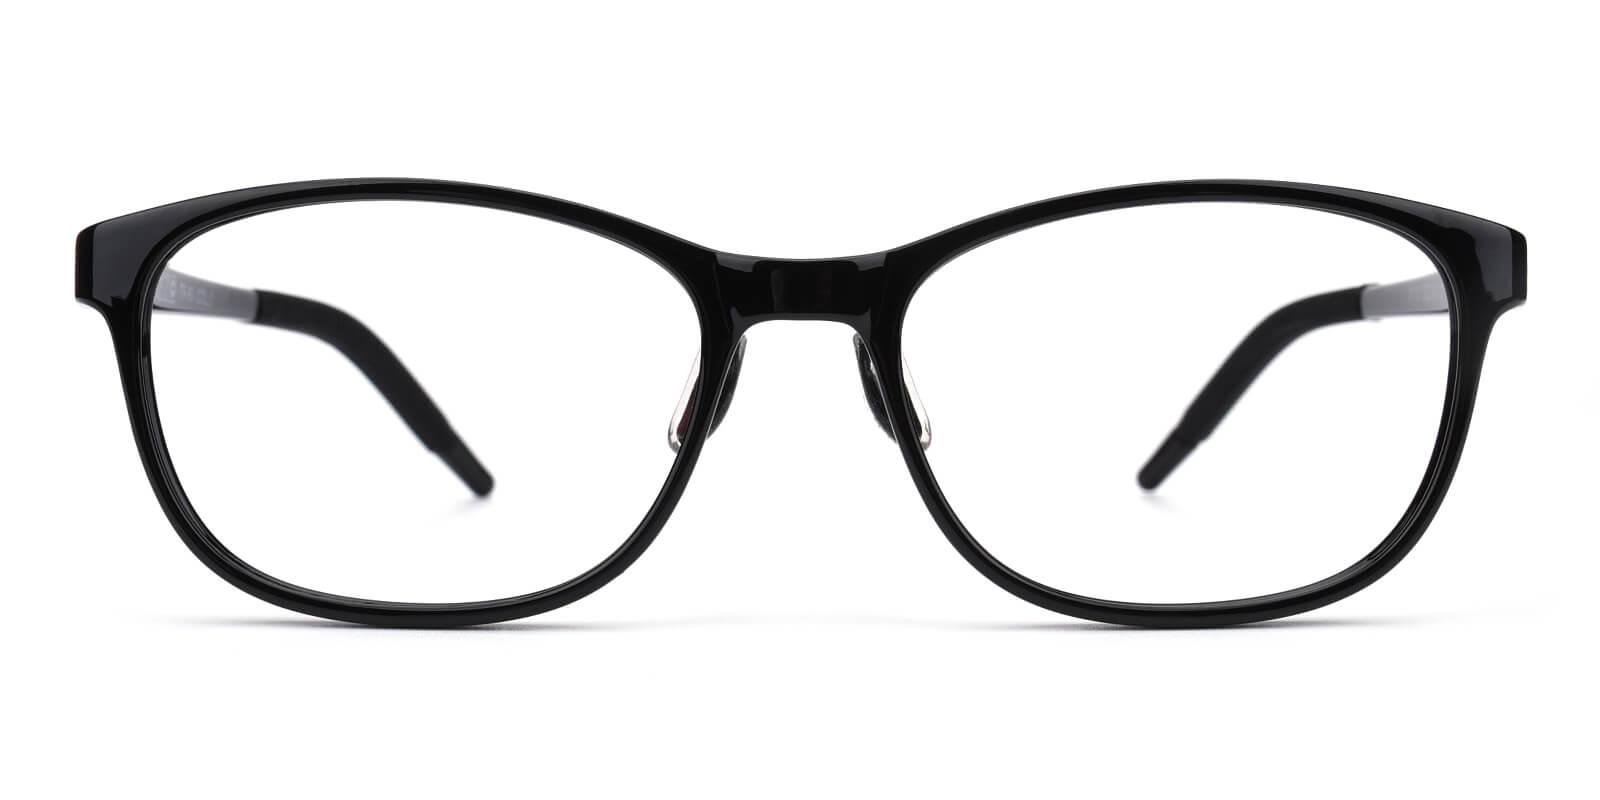 Lochlosa-Black-Rectangle-TR-Eyeglasses-additional2